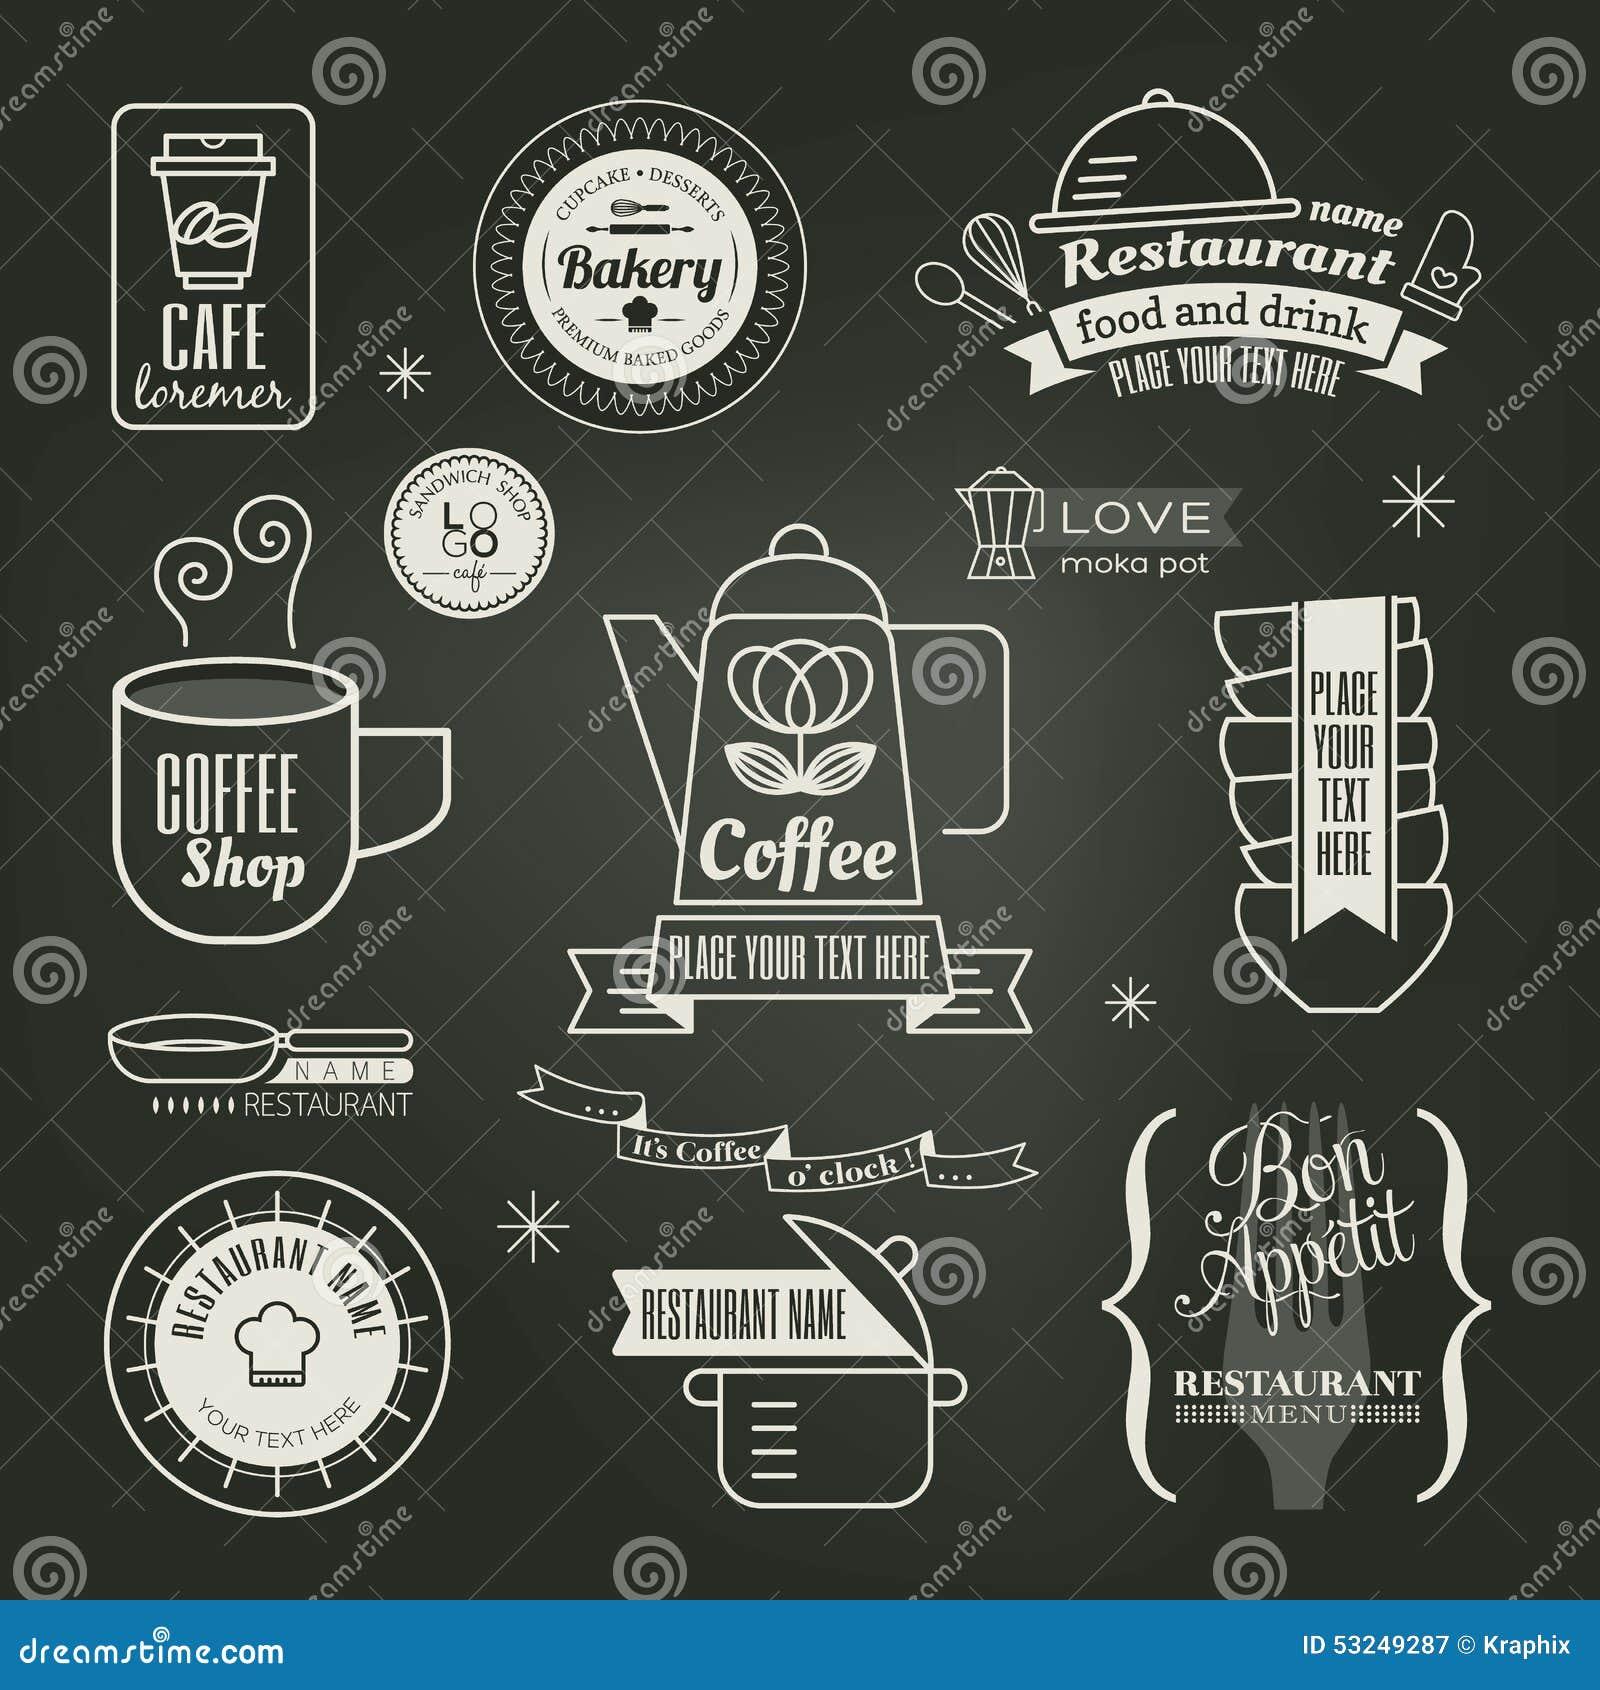 Vintage Retro Restaurant Cafe Logo Design Stock Vector - Image ...